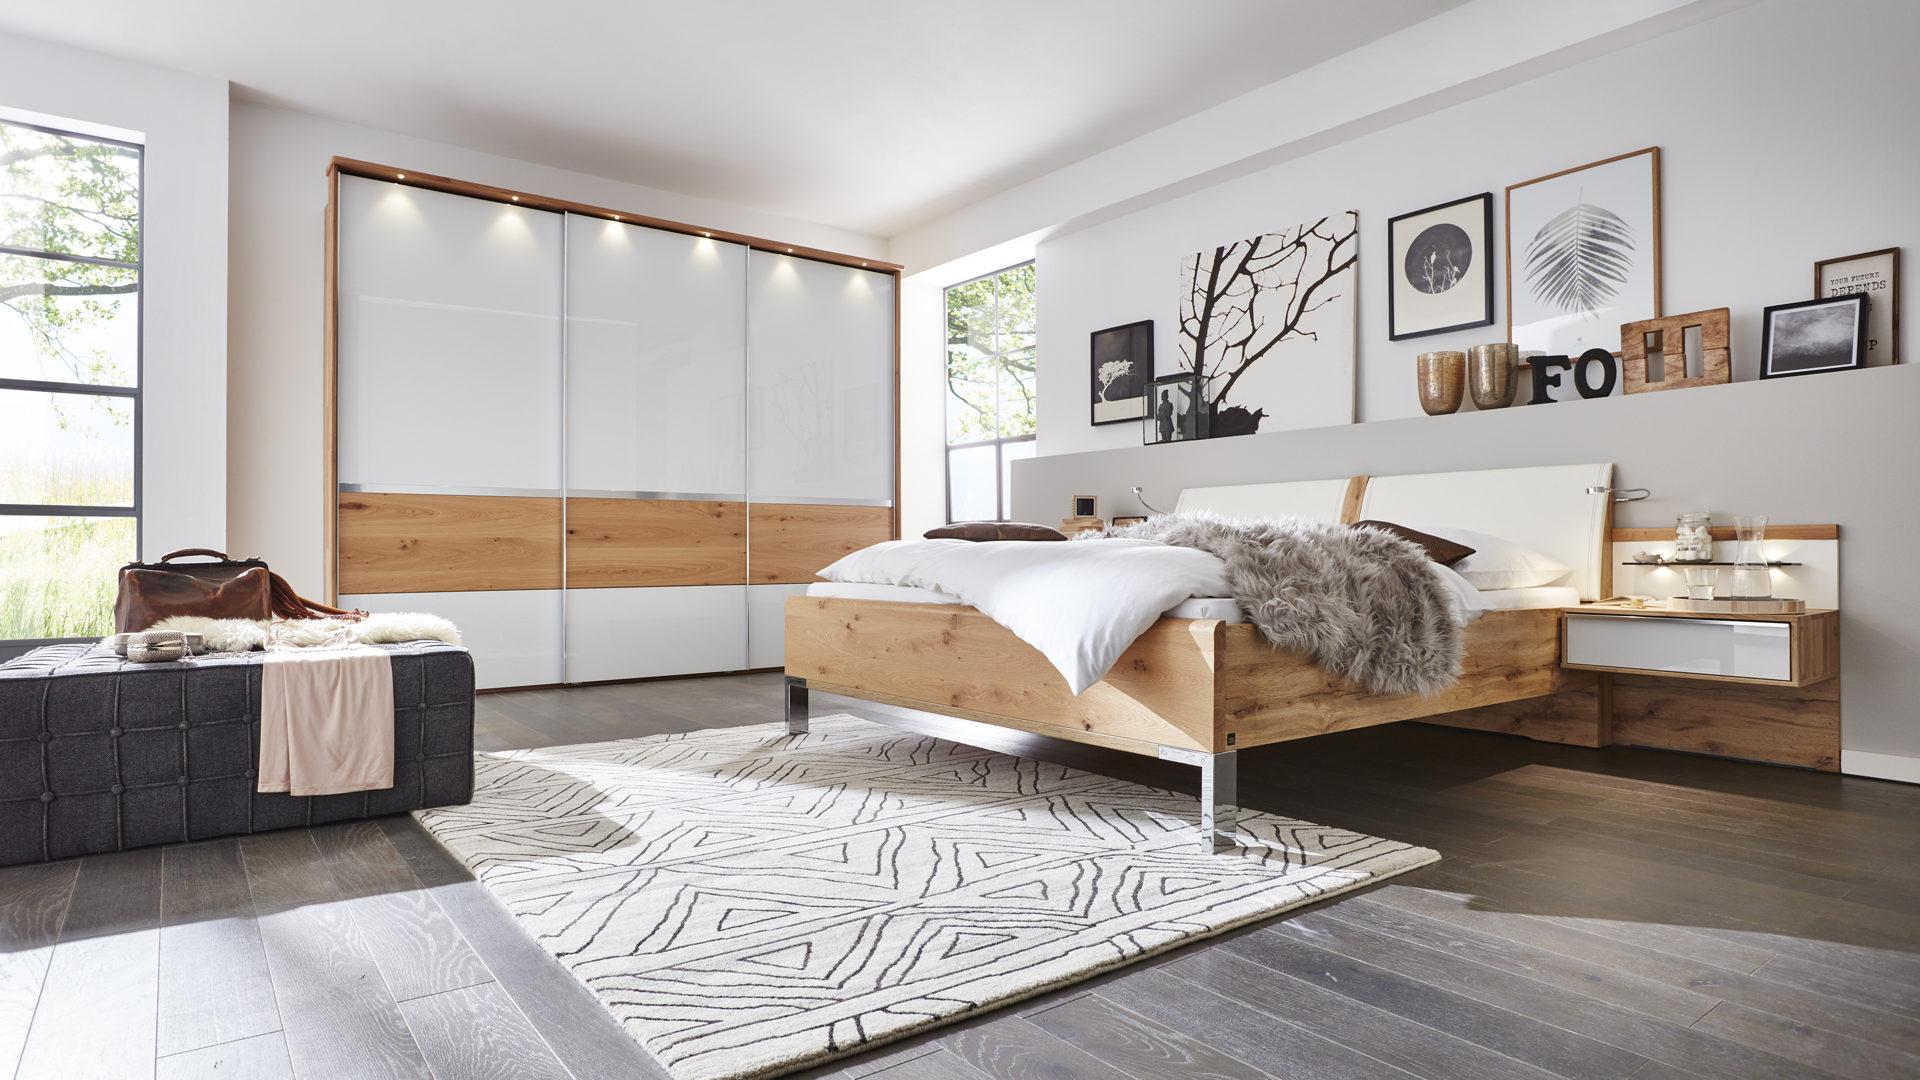 Schlafzimmer Design Holz – Caseconrad.com